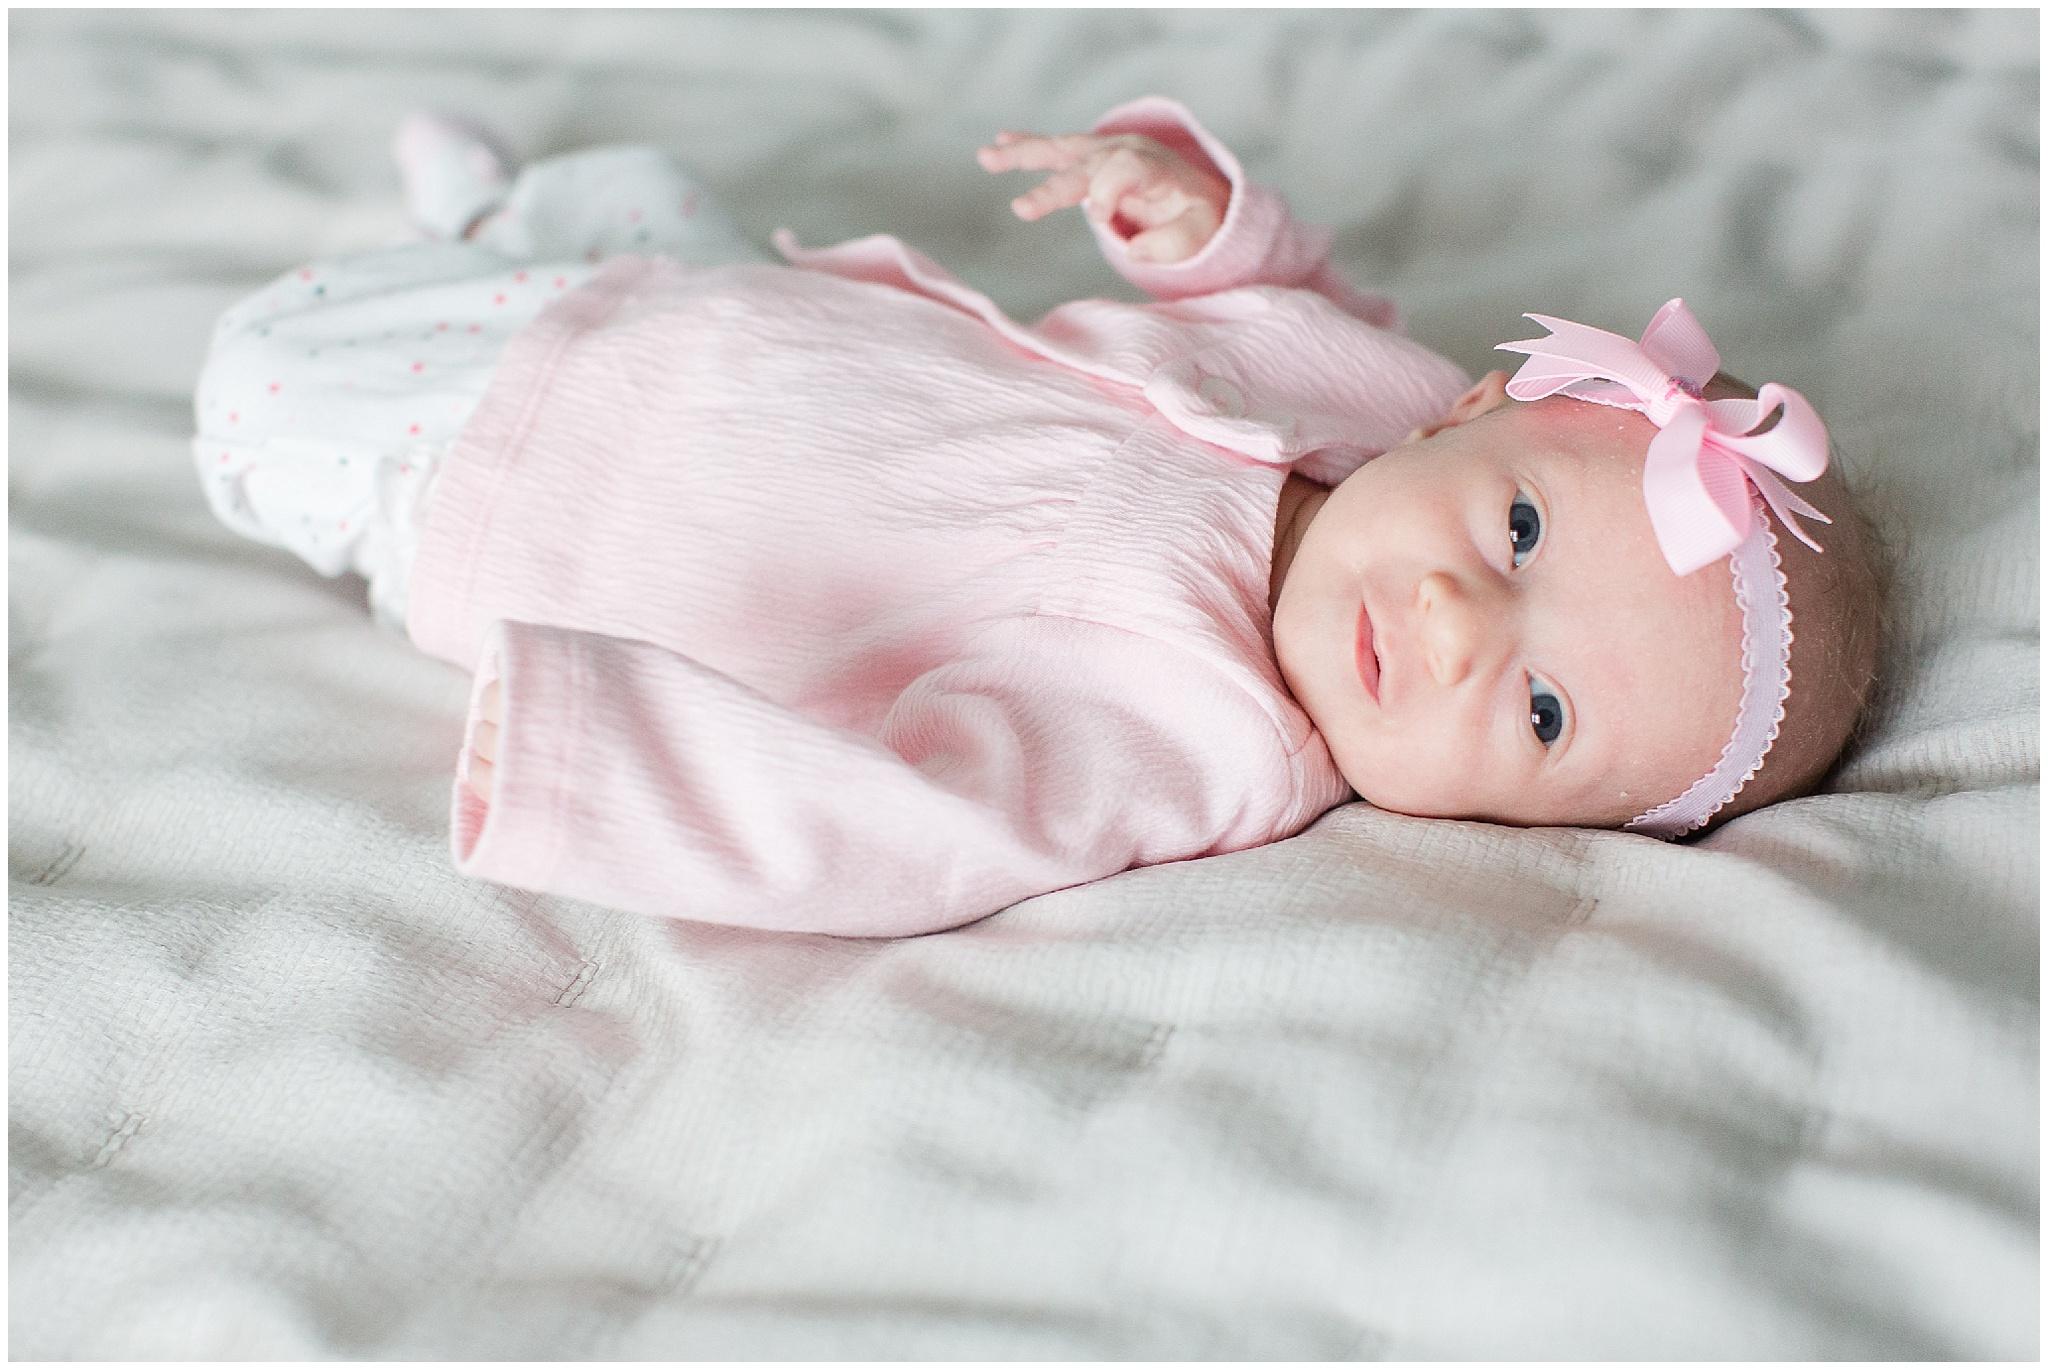 newborn_twins_photography_Gadgil_0003.jpg